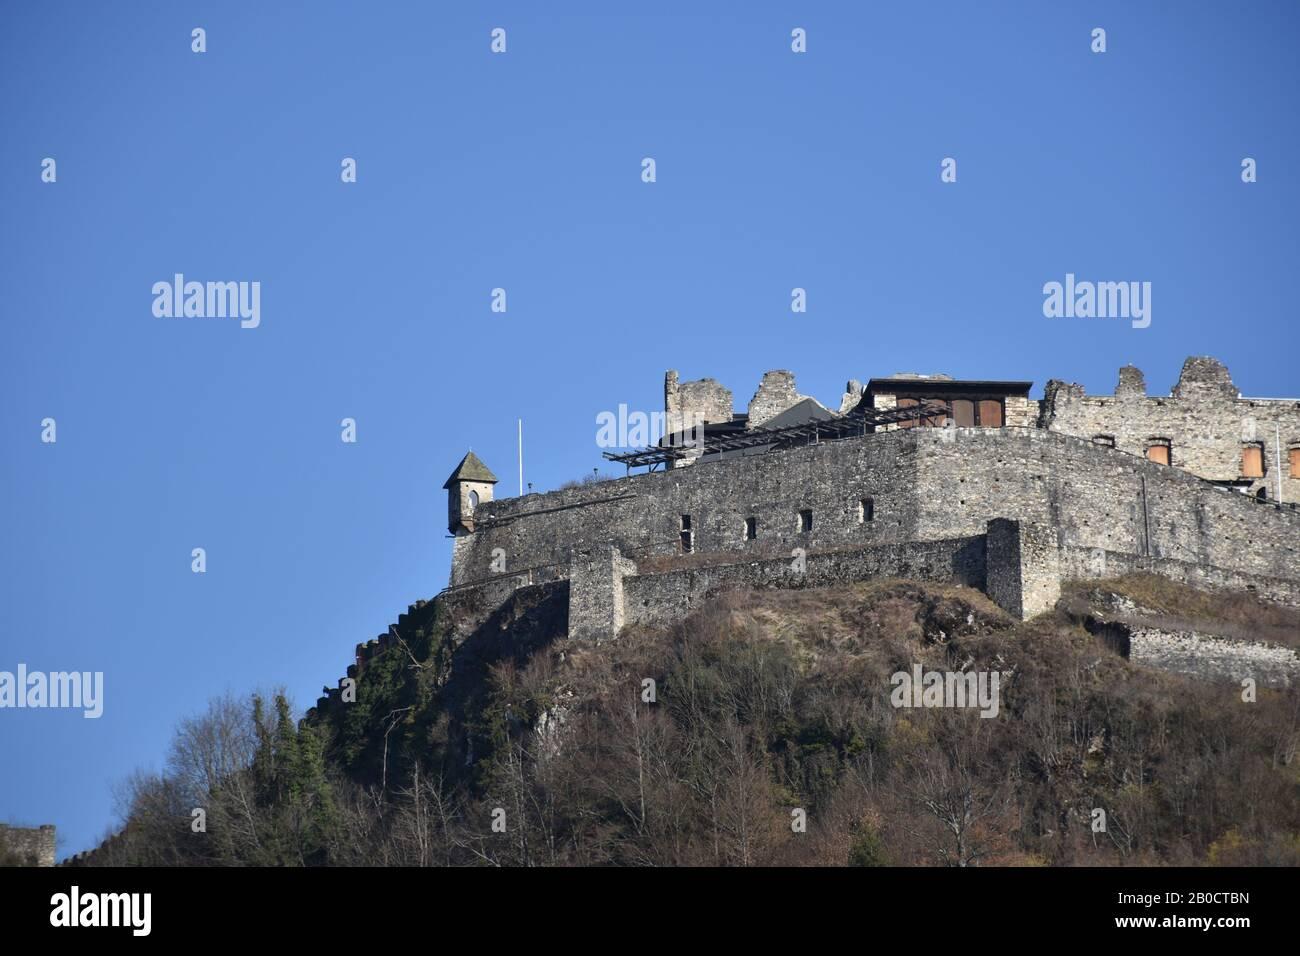 Burg Landskron, Landskron, Kärnten, Villach, Burg, Burgruine, Turm, Festung, Felsenburg, Ossiacher Tauern, Grad Vajškra, Mittelalter, Arena, Höhenburg Stock Photo